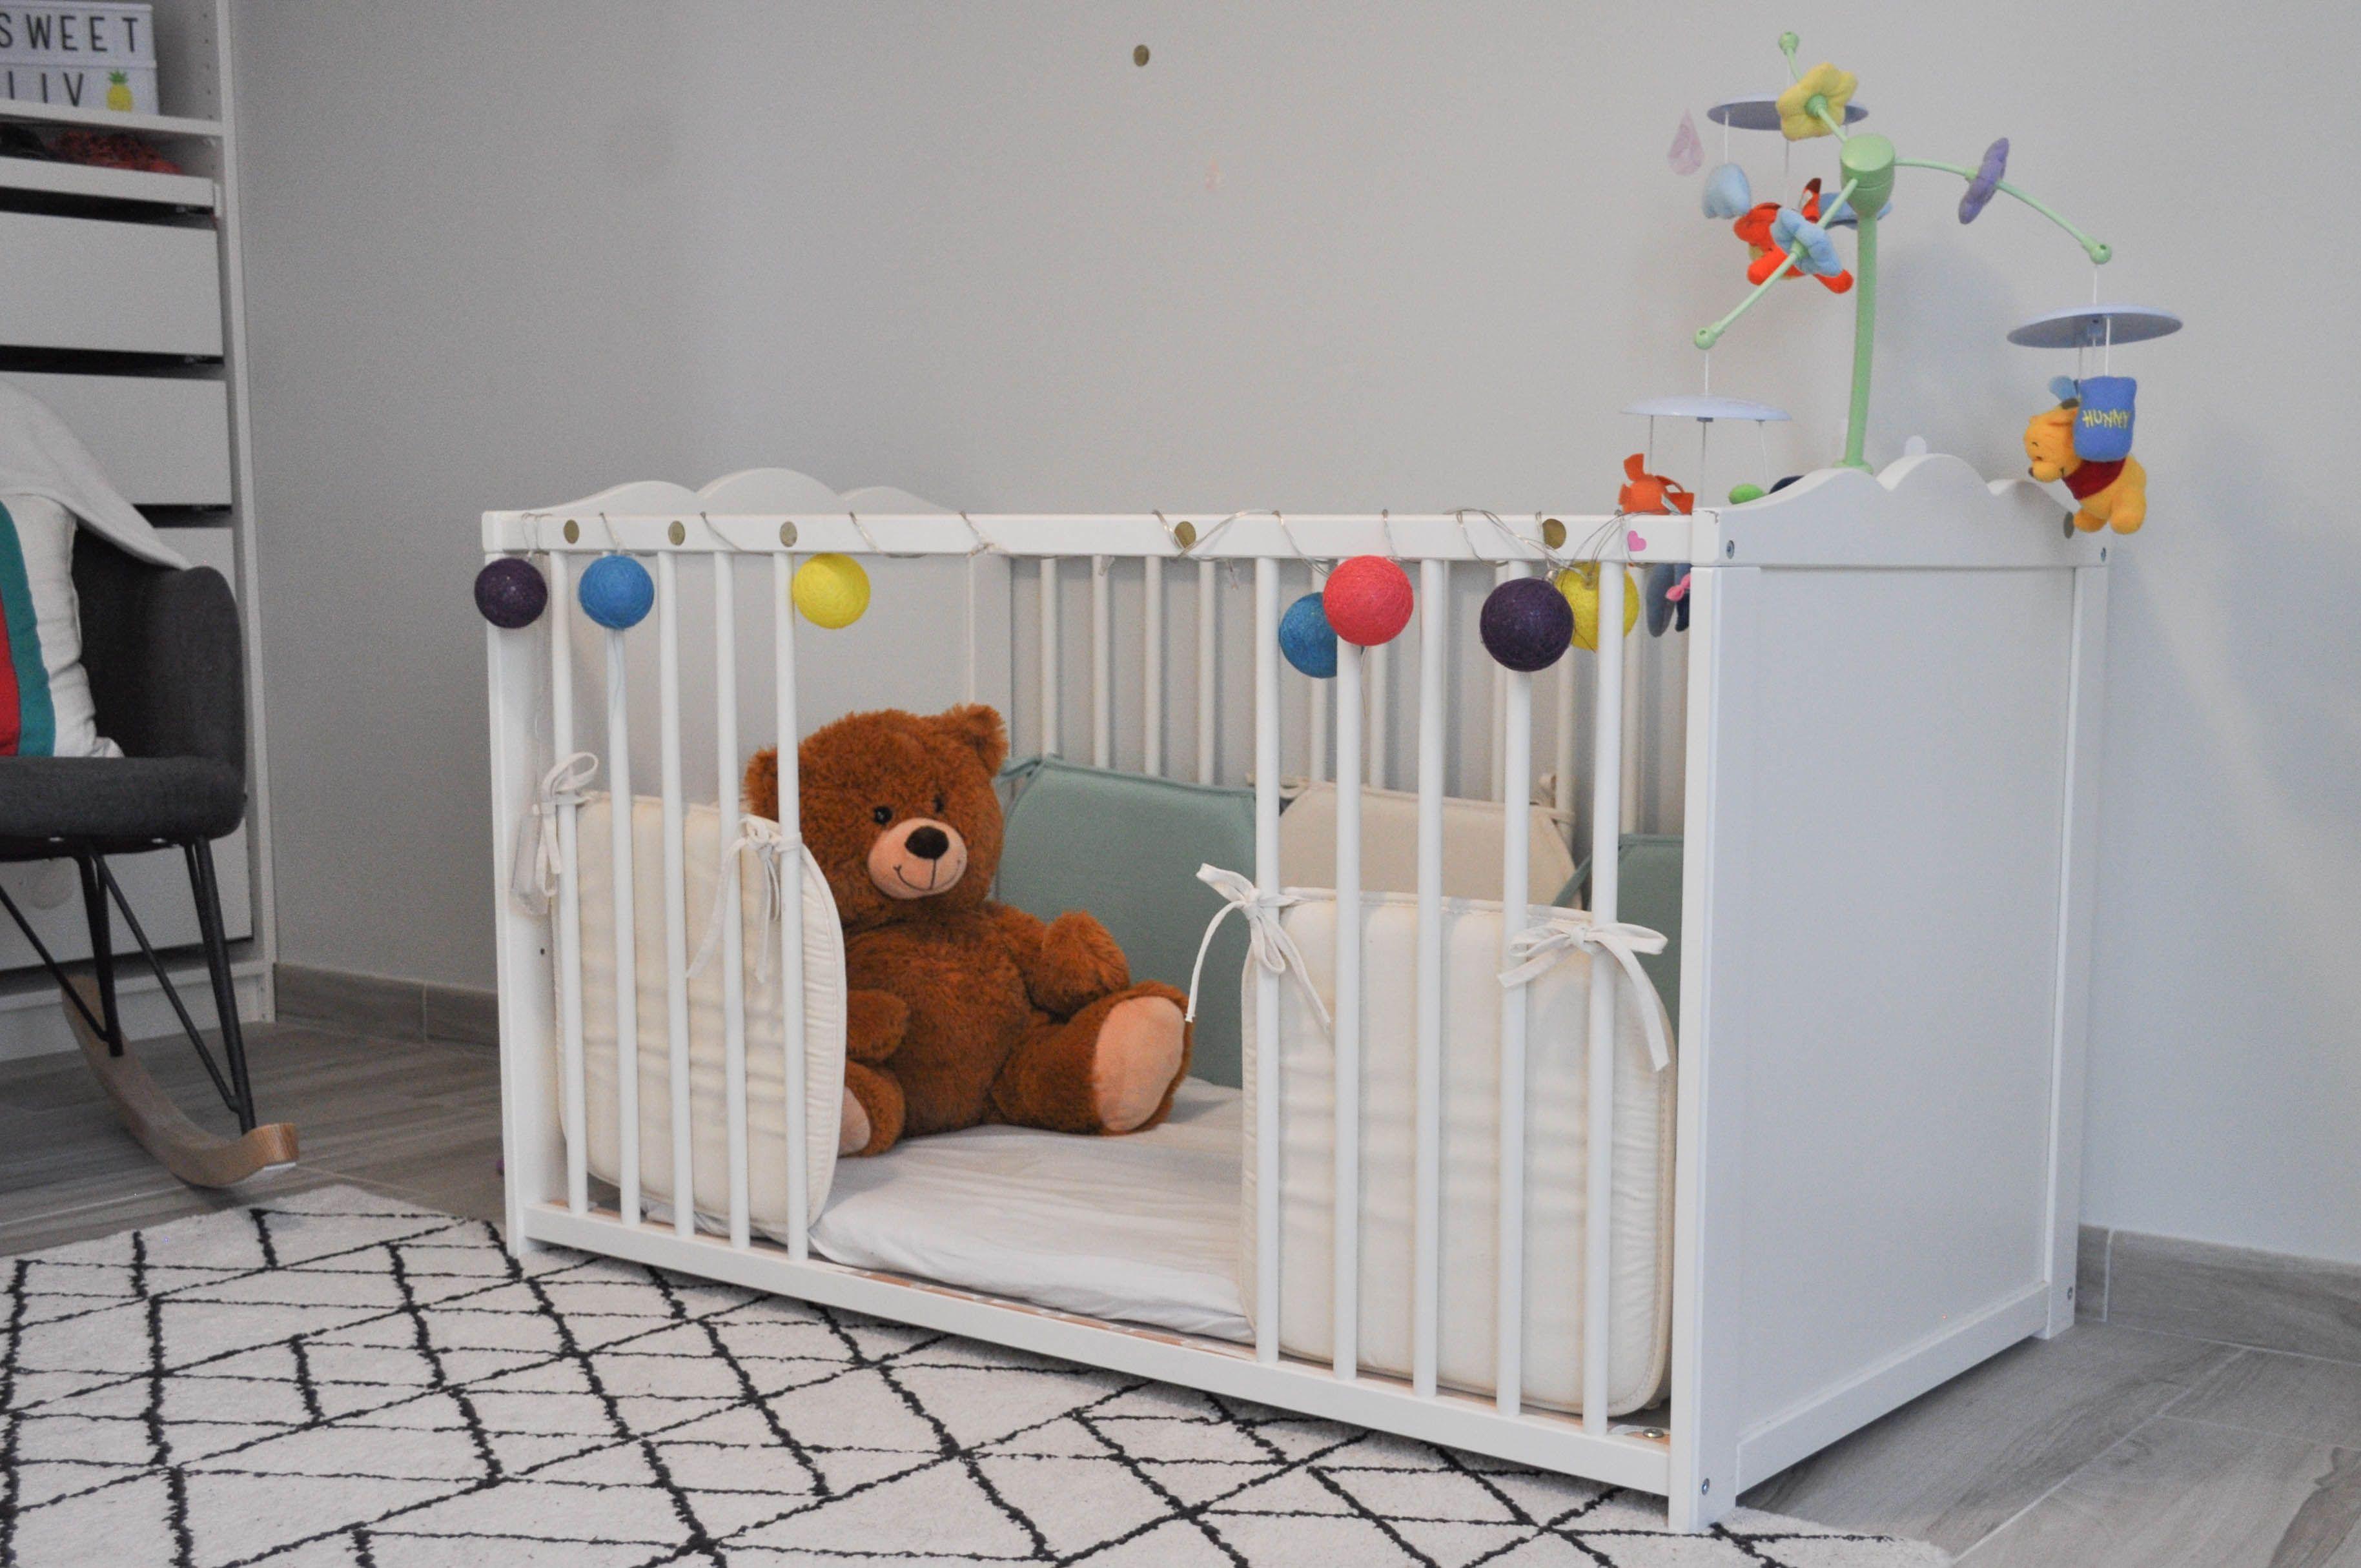 Le Lit De Bebe Facon Montessori On A Essaye Et Echoue Lit Bebe Ikea Lit Bebe Lit Barreau